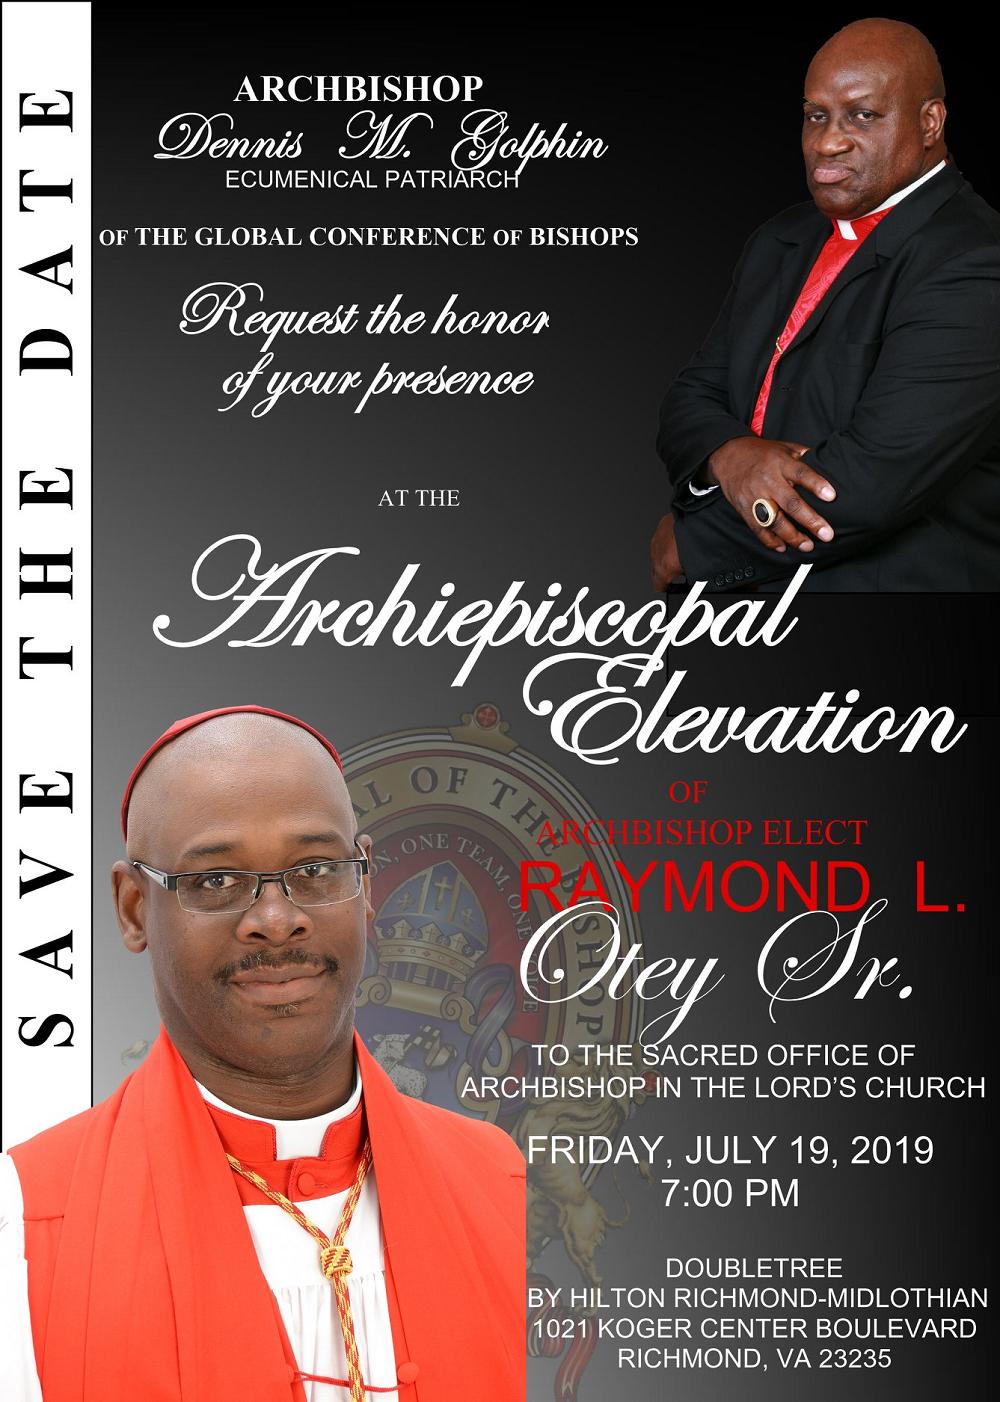 Archiepiscopal Elevation